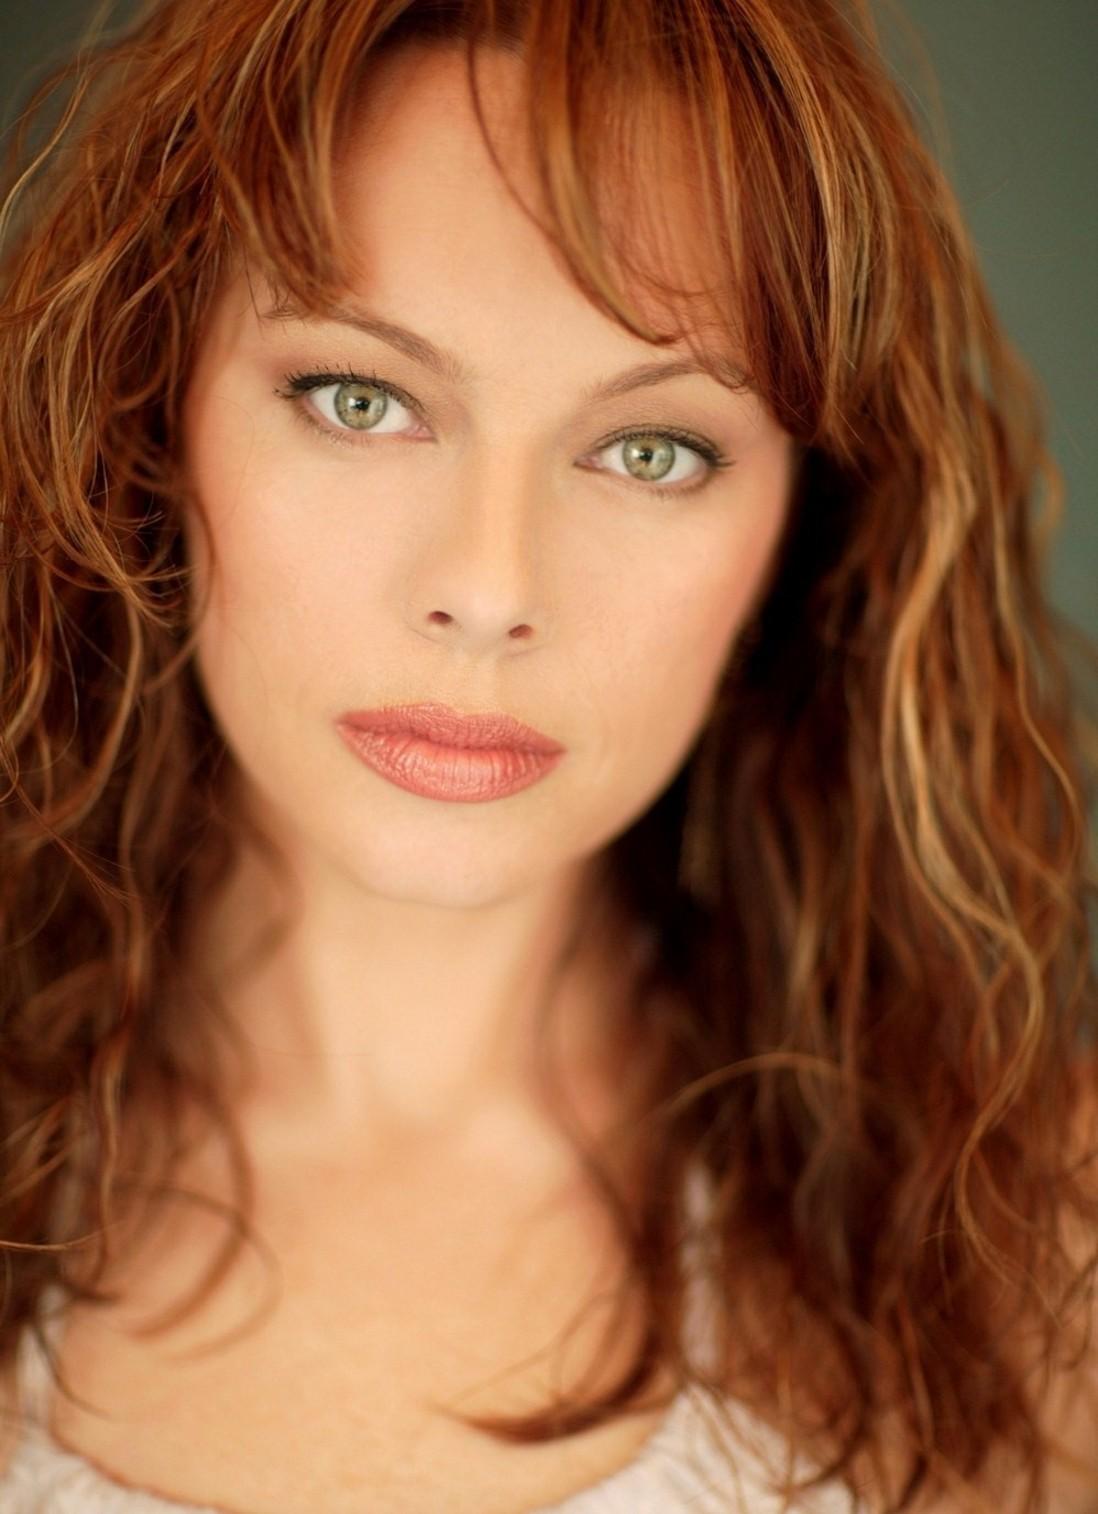 Melinda clarke age 44 gurrrlll be lookin 39 good for Melinda clarke